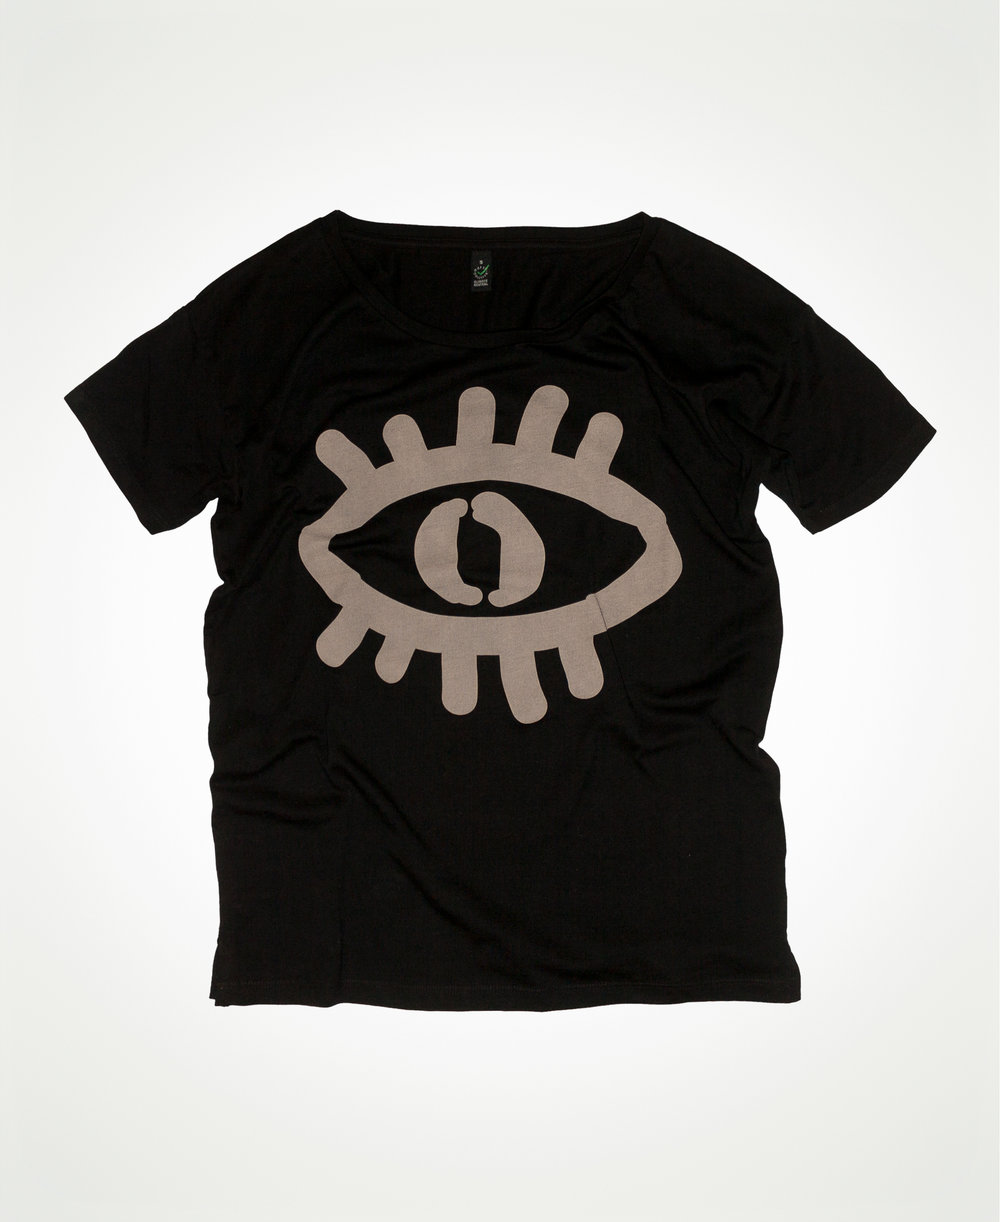 oog-tencel-t-shirt.jpg